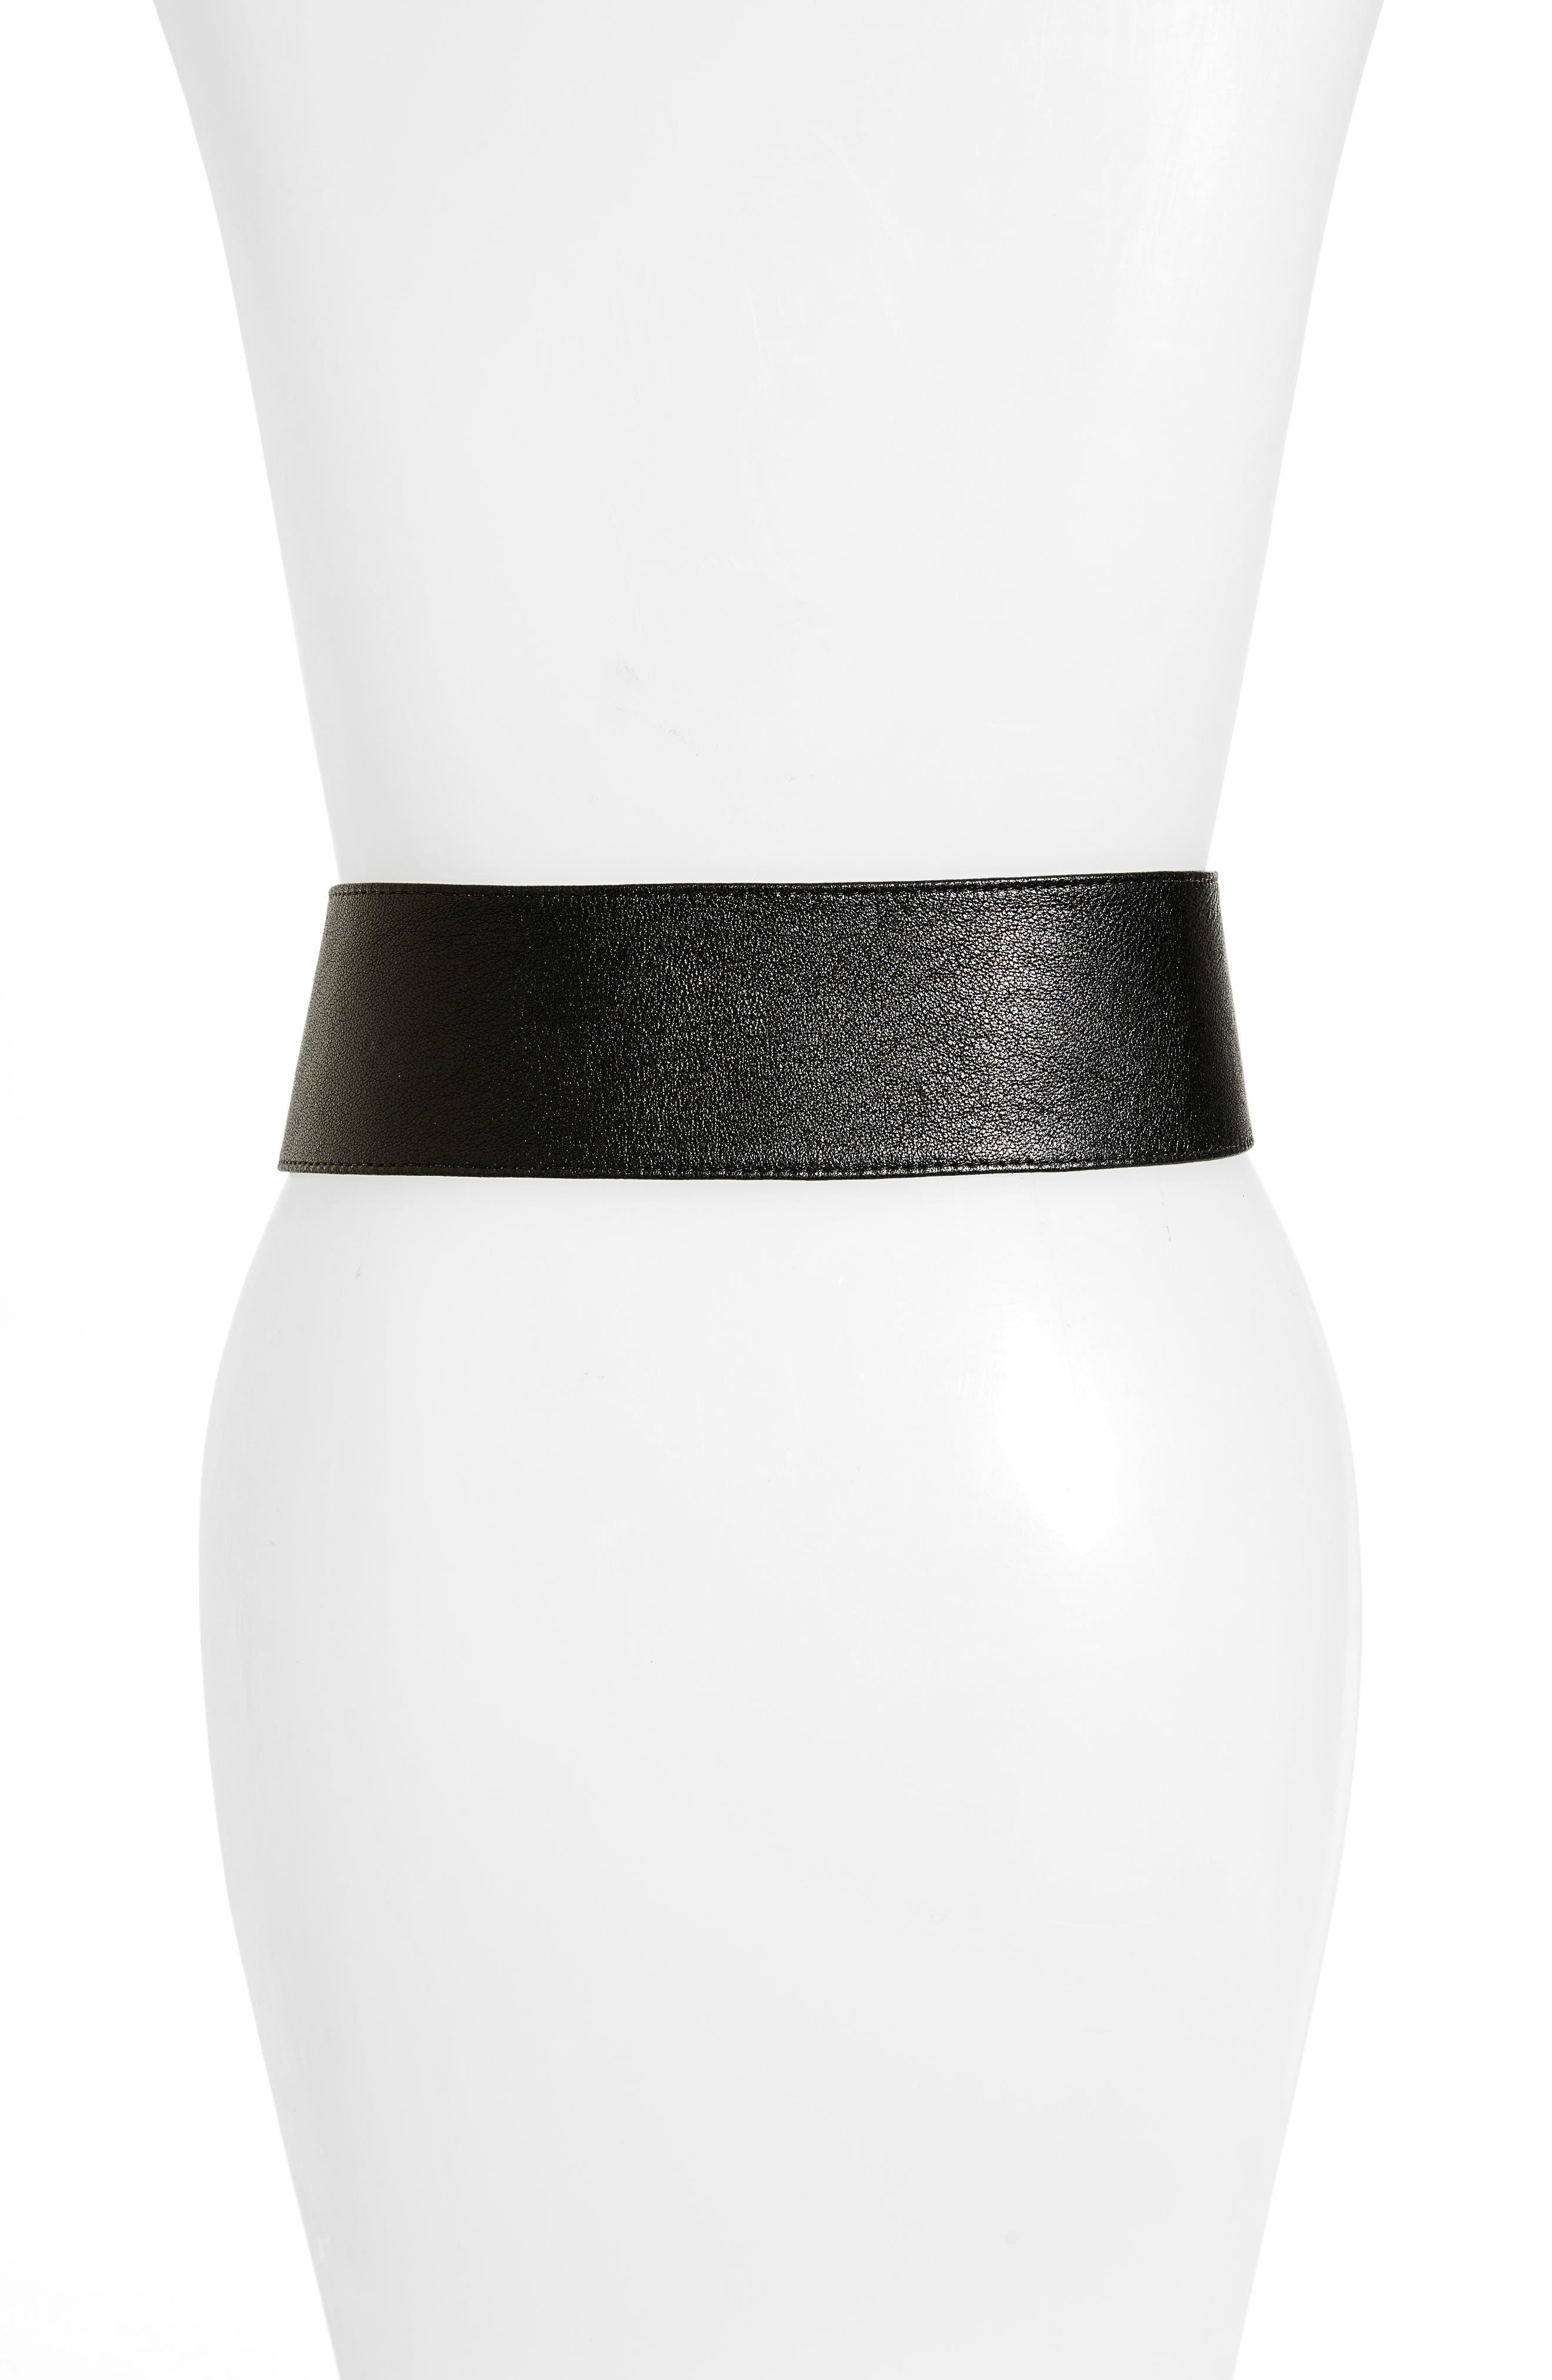 RAINA,                             Vixen Leather Belt,                             Alternate thumbnail 2, color,                             BLACK/ BROWN